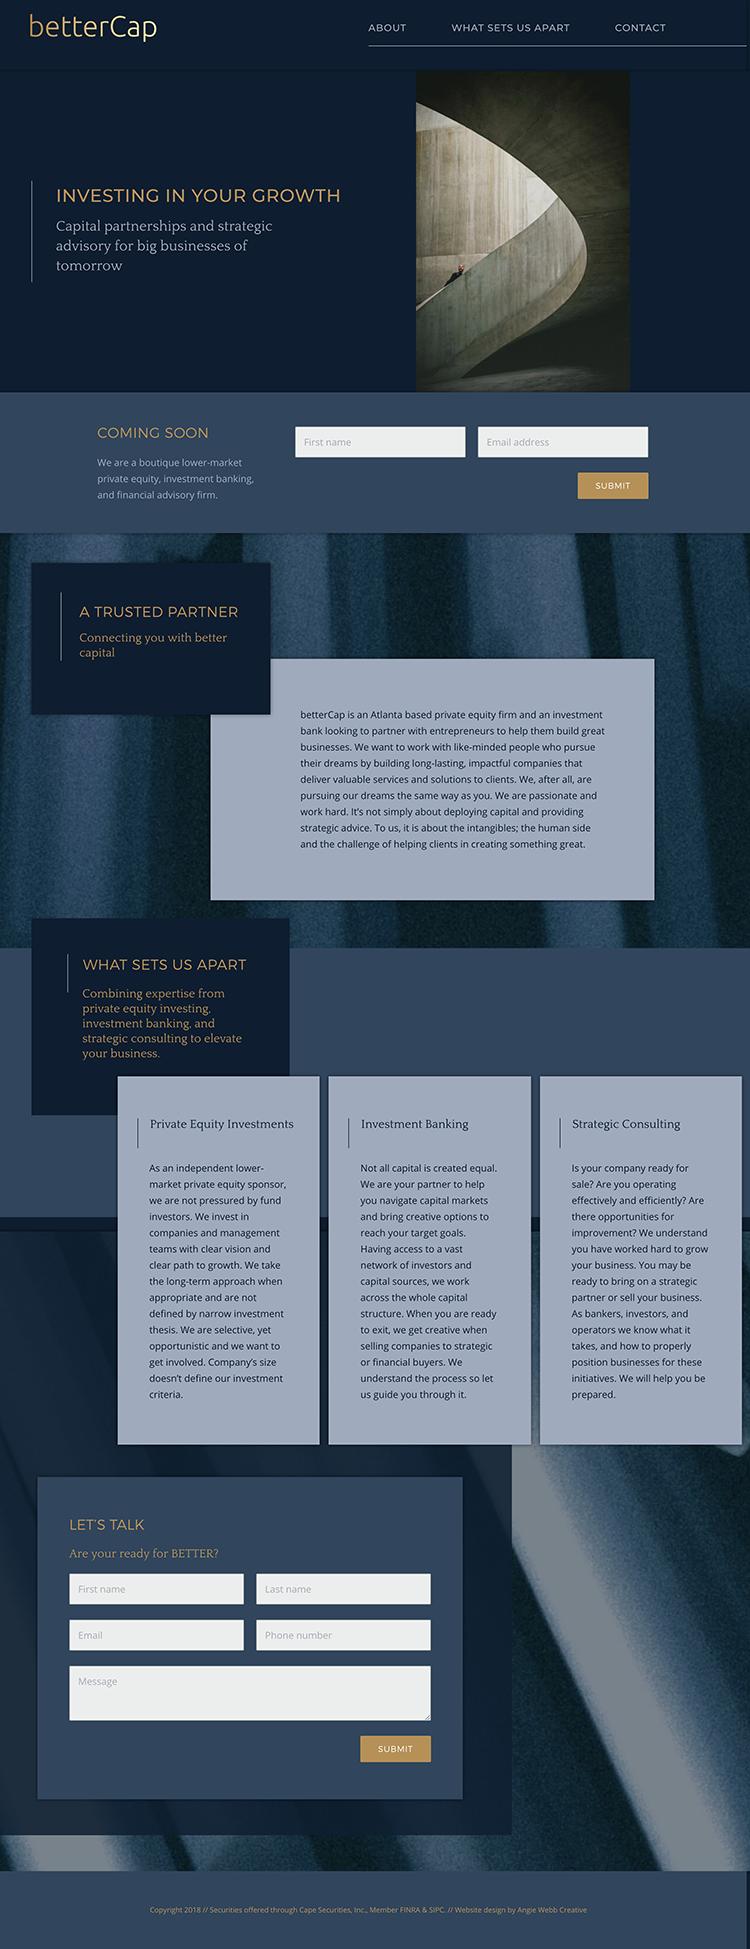 Web Design And Branding Portfolio With Images Custom Web Design Web Design Wordpress Website Design